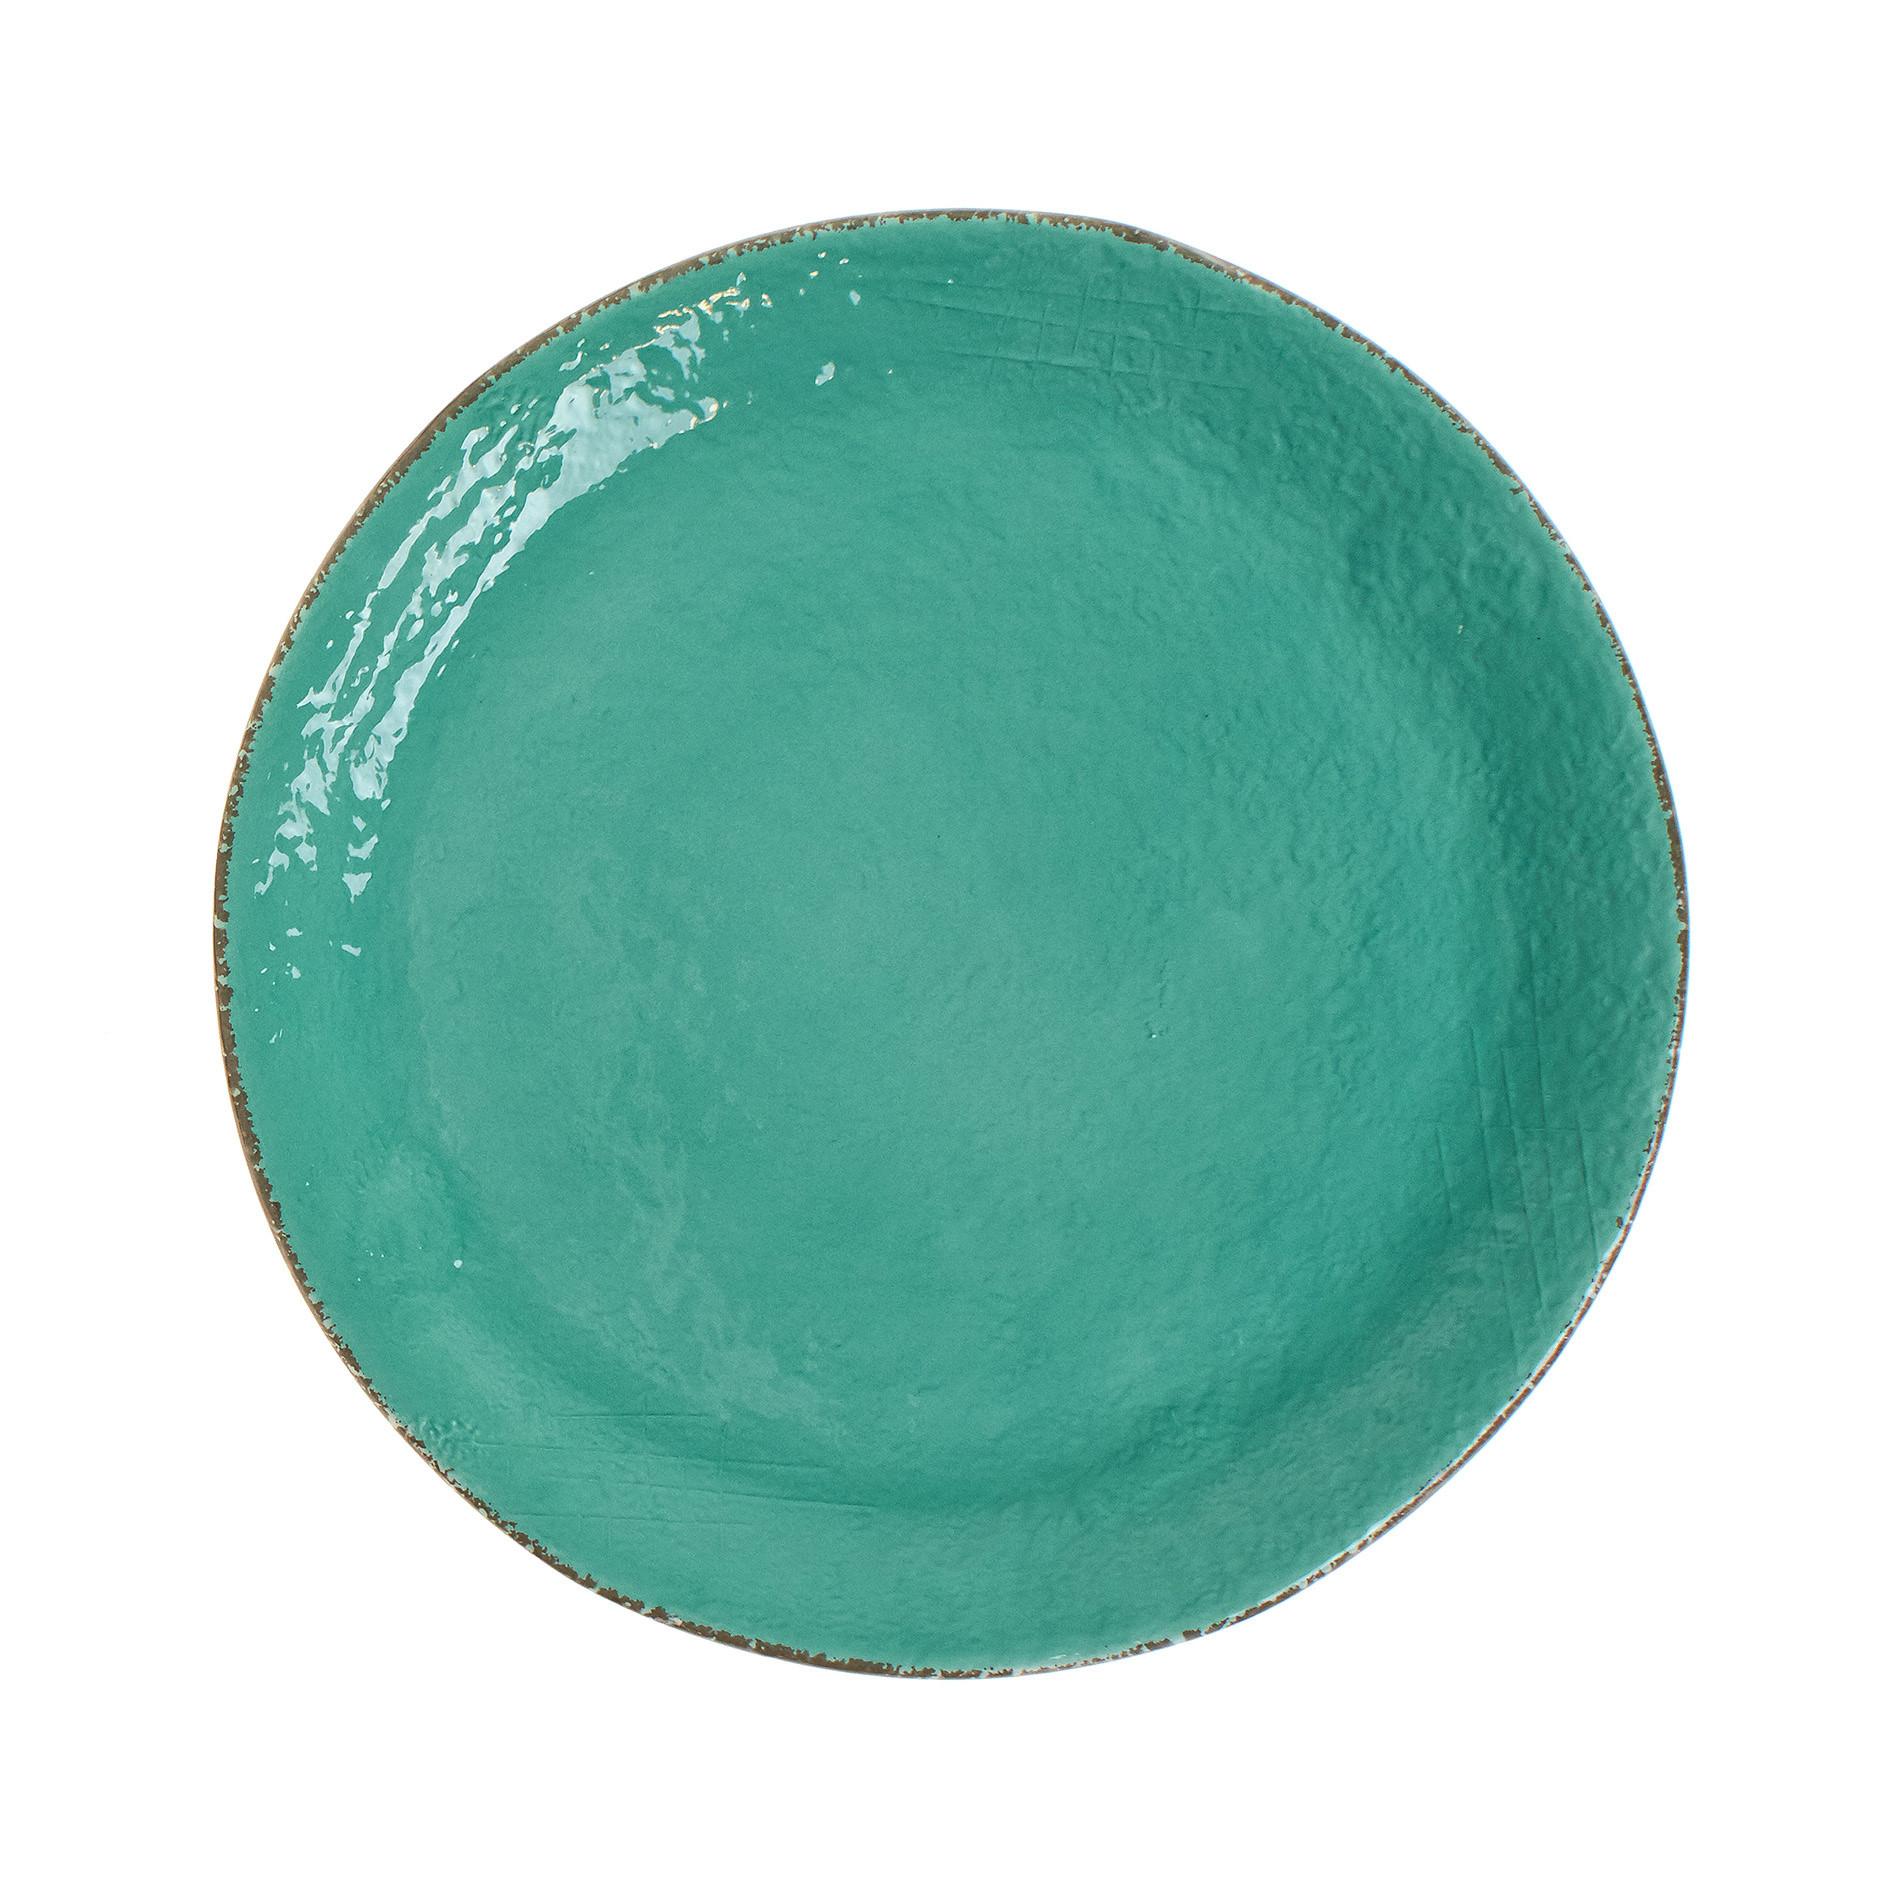 Piatto da portata ceramica artigianale Preta, Verde acqua, large image number 0